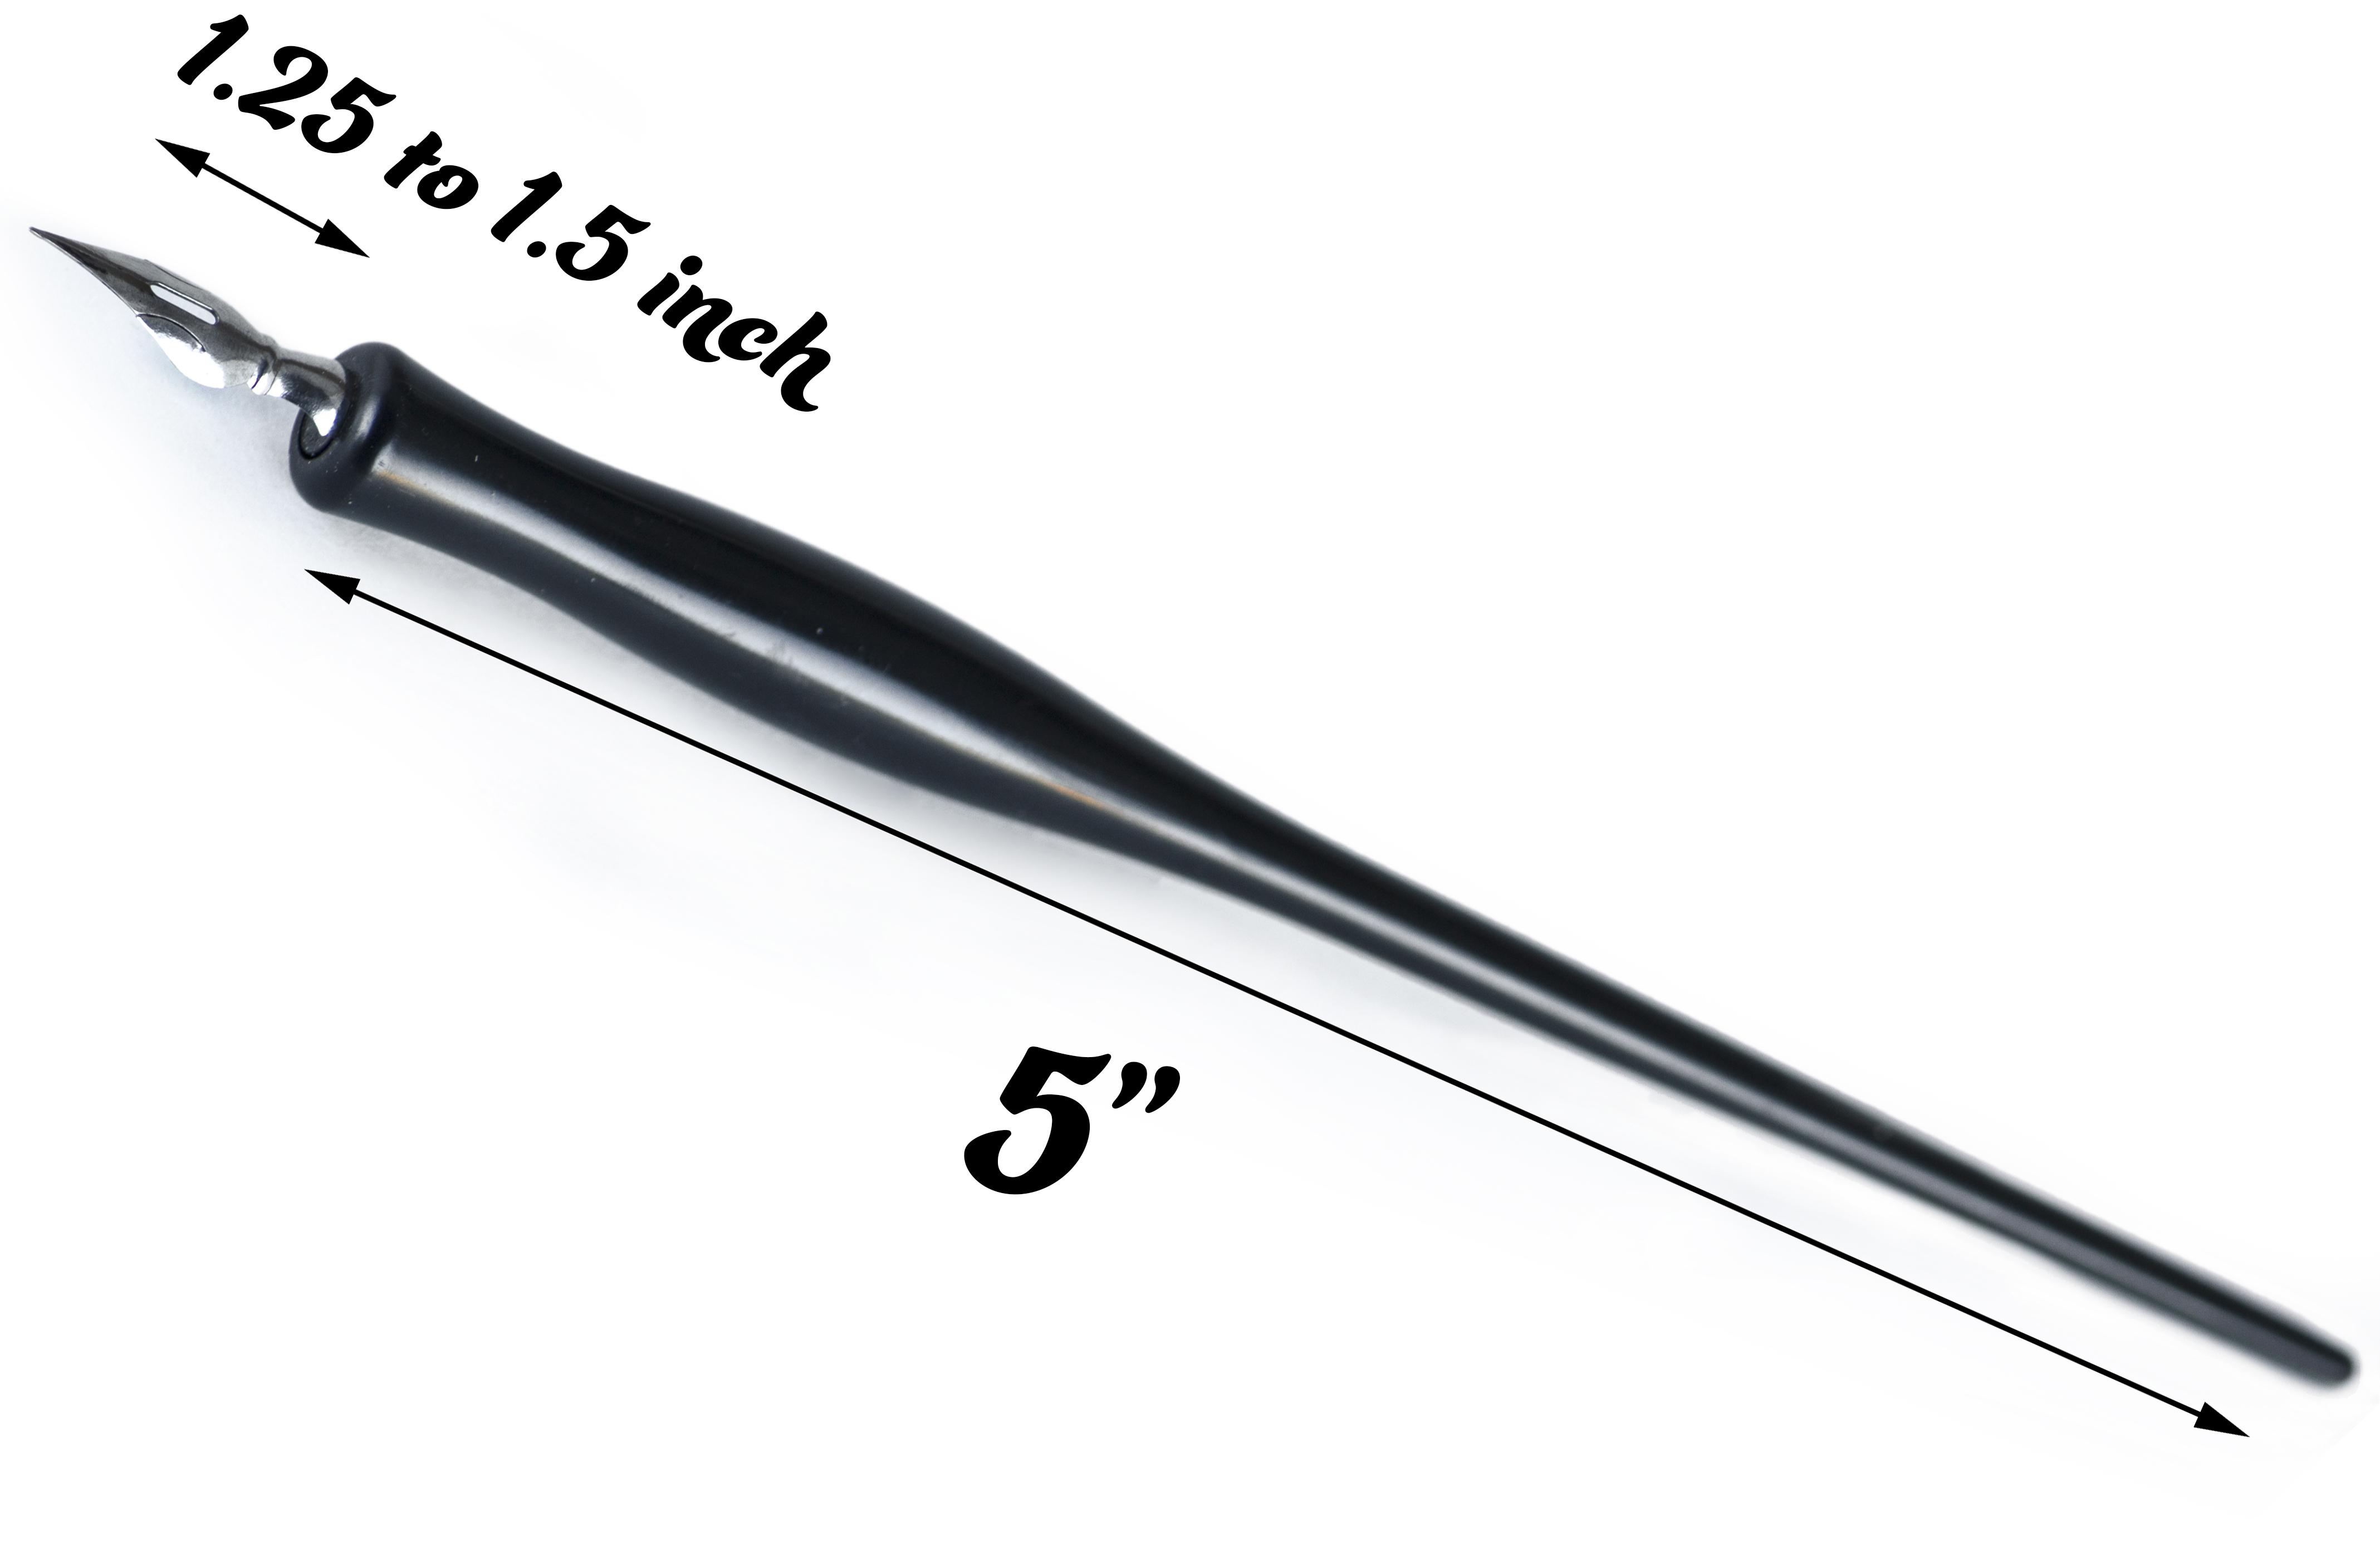 B07DDK6LZ3 - Calligraphy Dip Pen & Net S